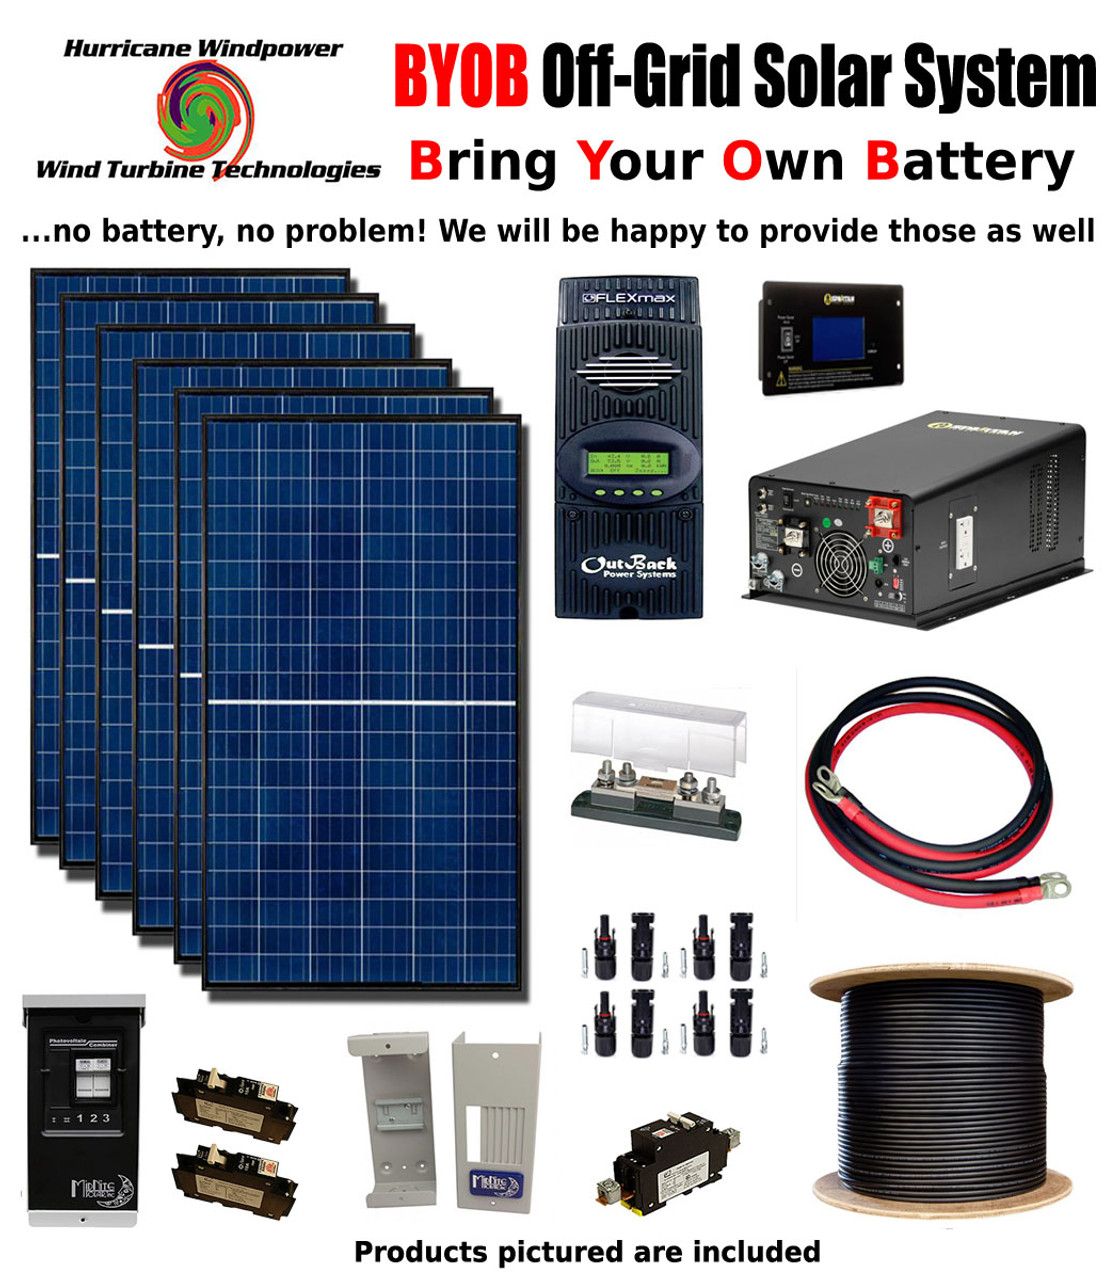 medium resolution of byob off grid 1740w 24v solar panel kit tiny house cabin pv system outback fm80